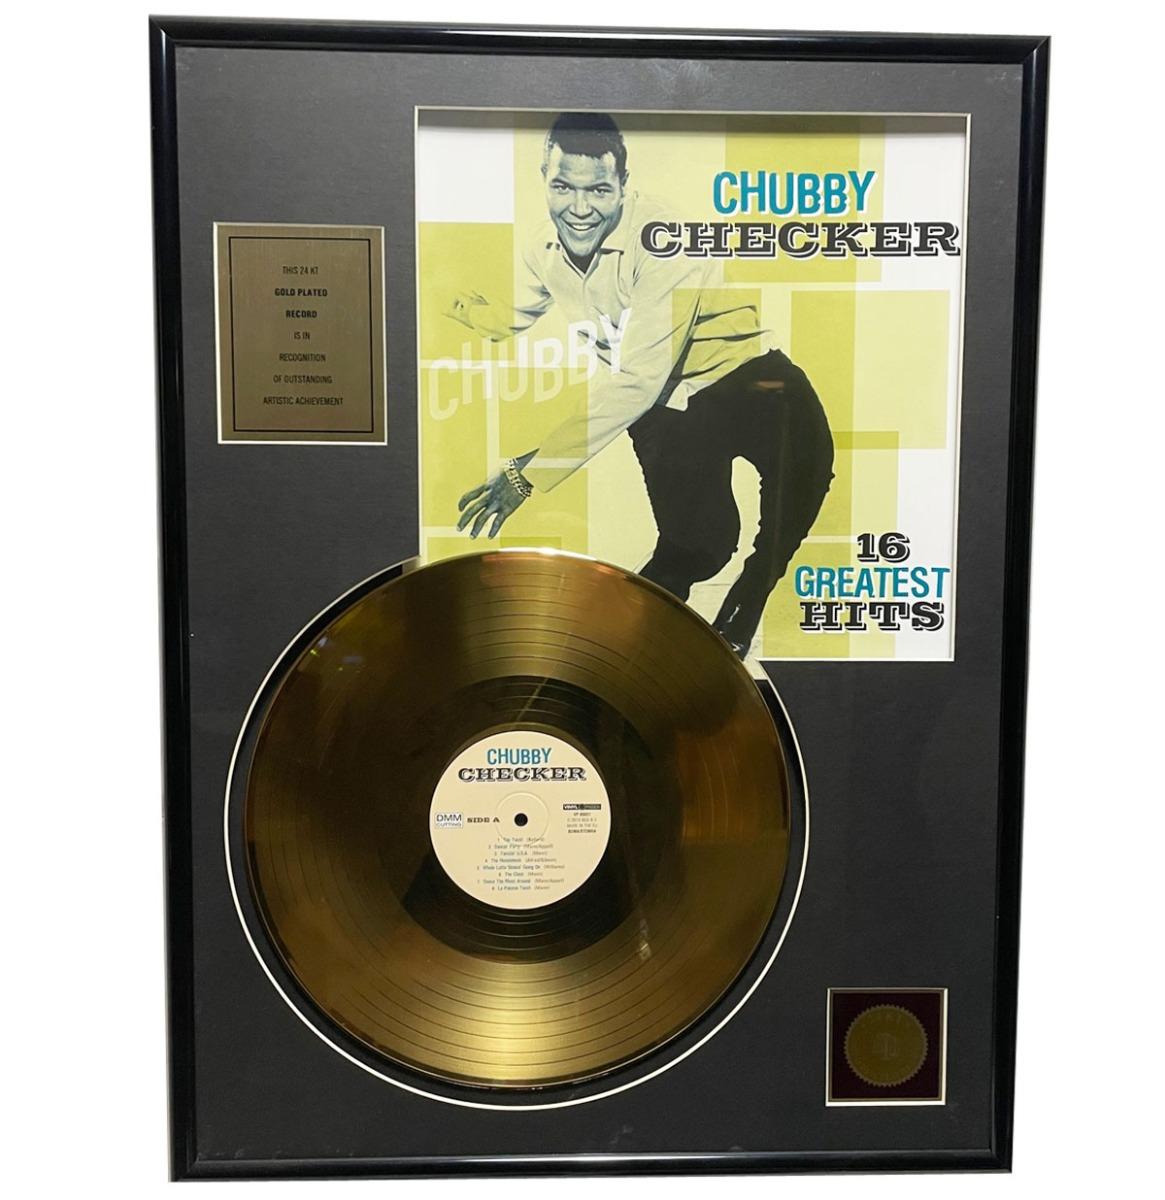 Chubby Checker - 16 Greatest Hits 24KT Gouden Plaat LP